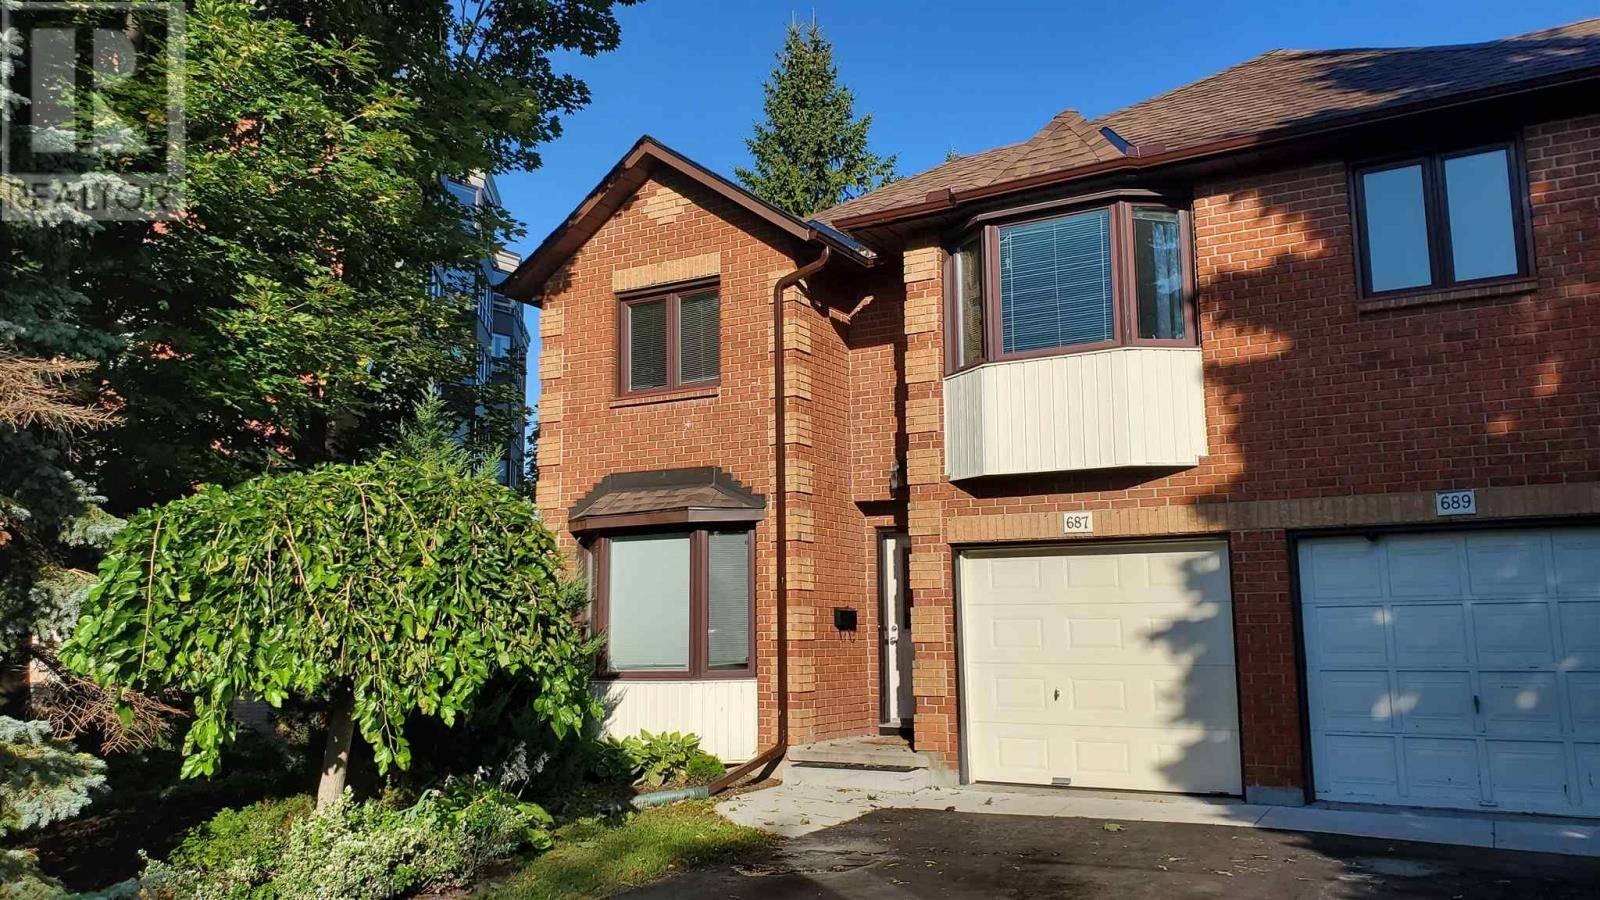 Townhouse for sale at 687 Davis Dr Unit 1 Kingston Ontario - MLS: K19006221